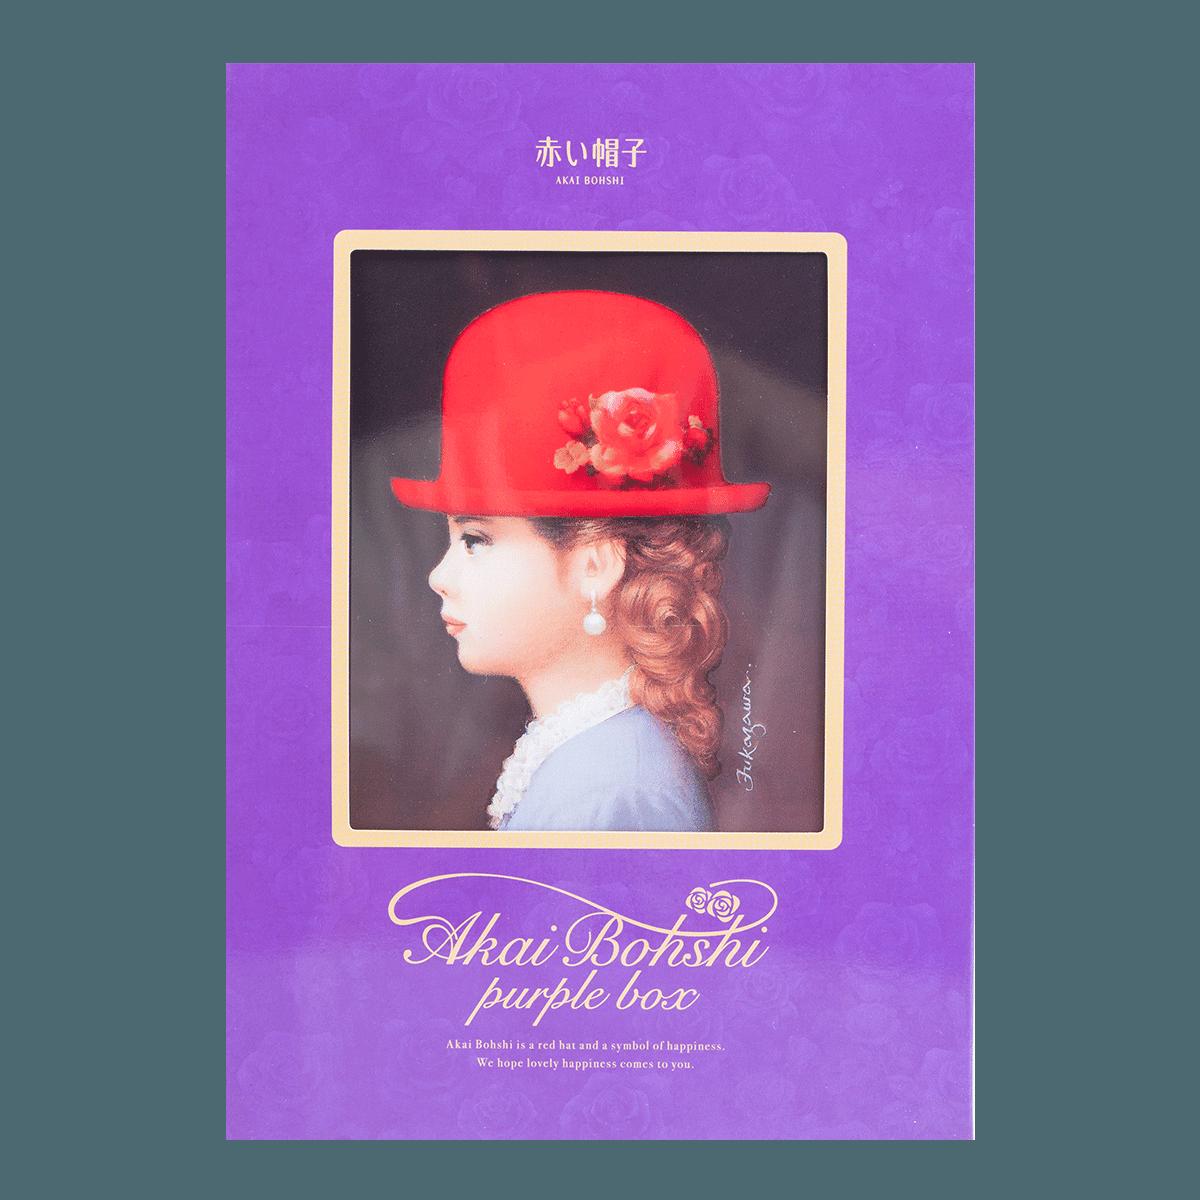 【Clearance】TIVOLINA Akai Bohshi Mixed Cookie Gift Box Purple Box 16pc